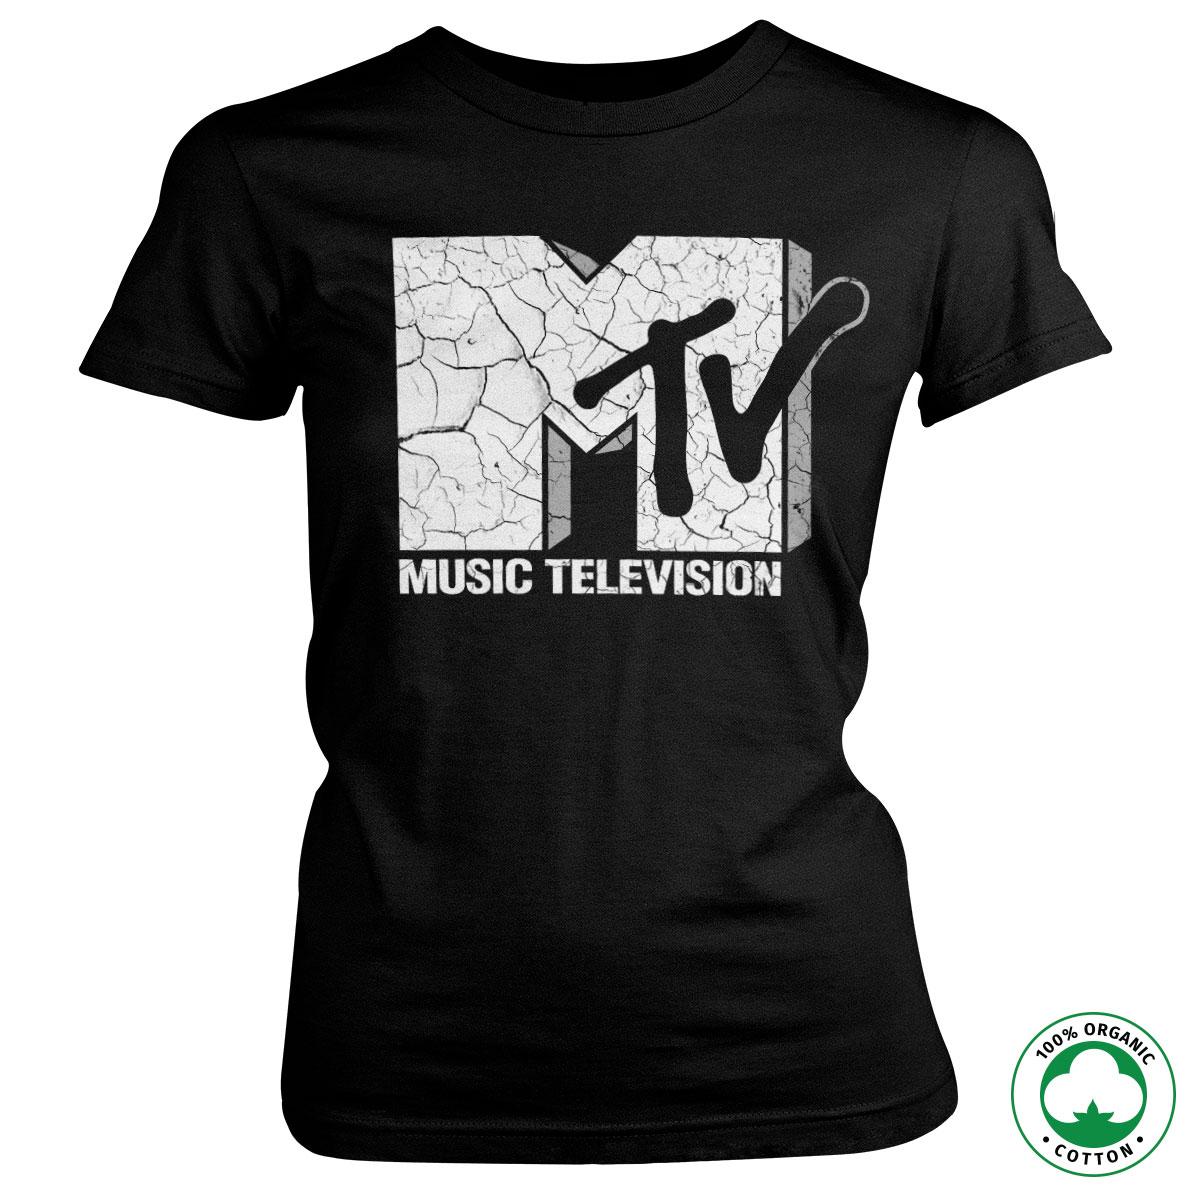 MTV-58-MTV005-BK